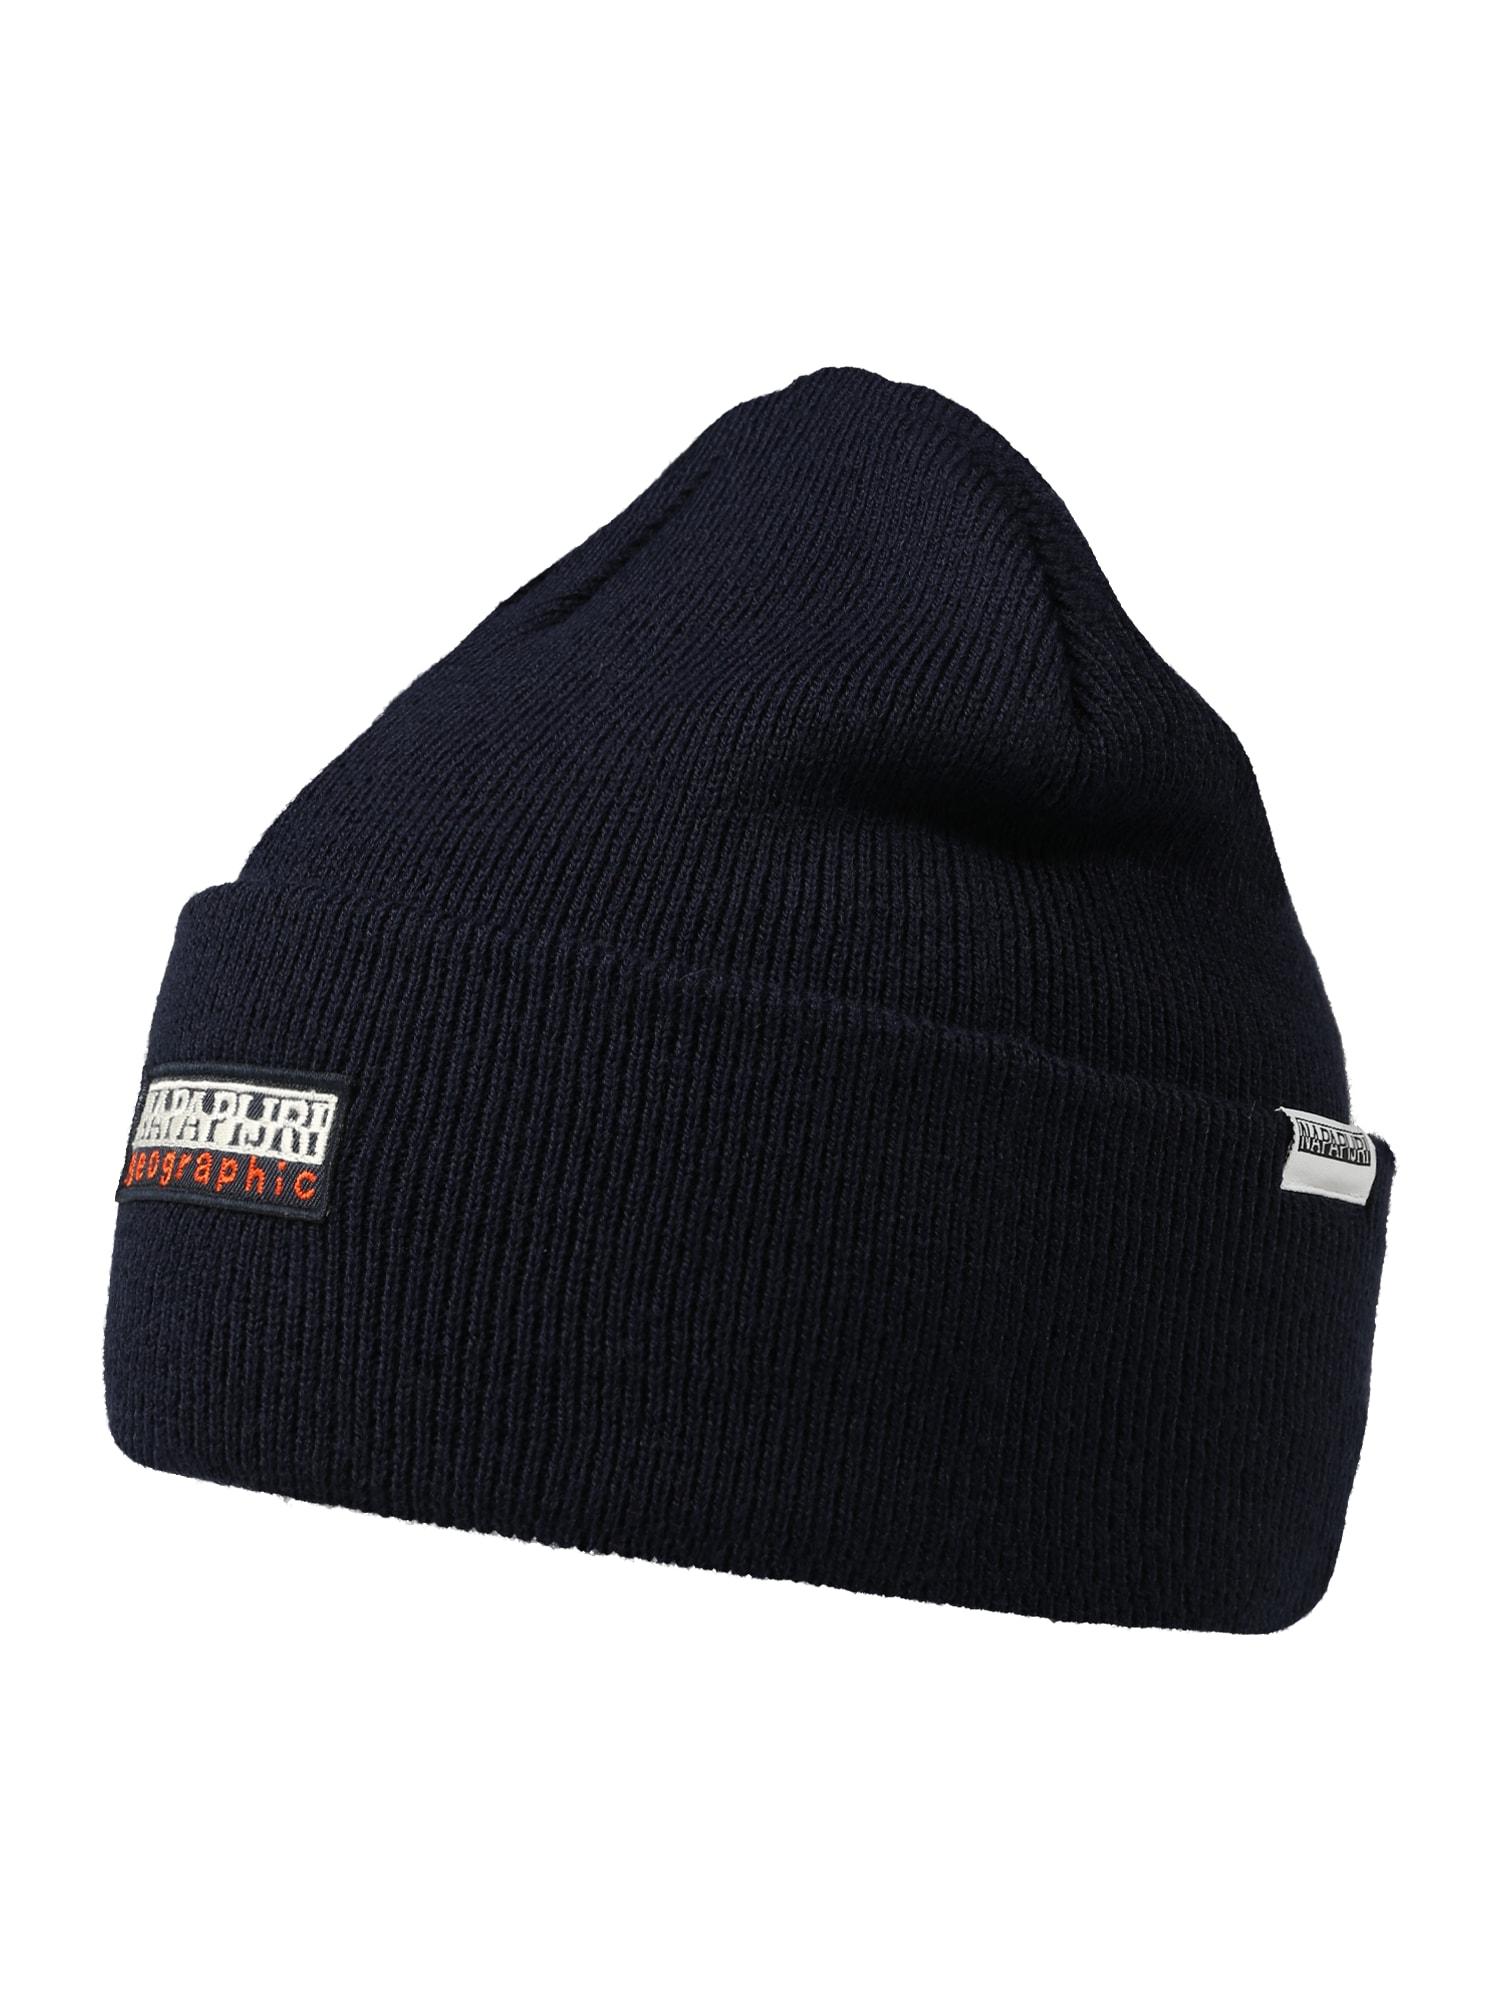 NAPAPIJRI Megzta kepurė